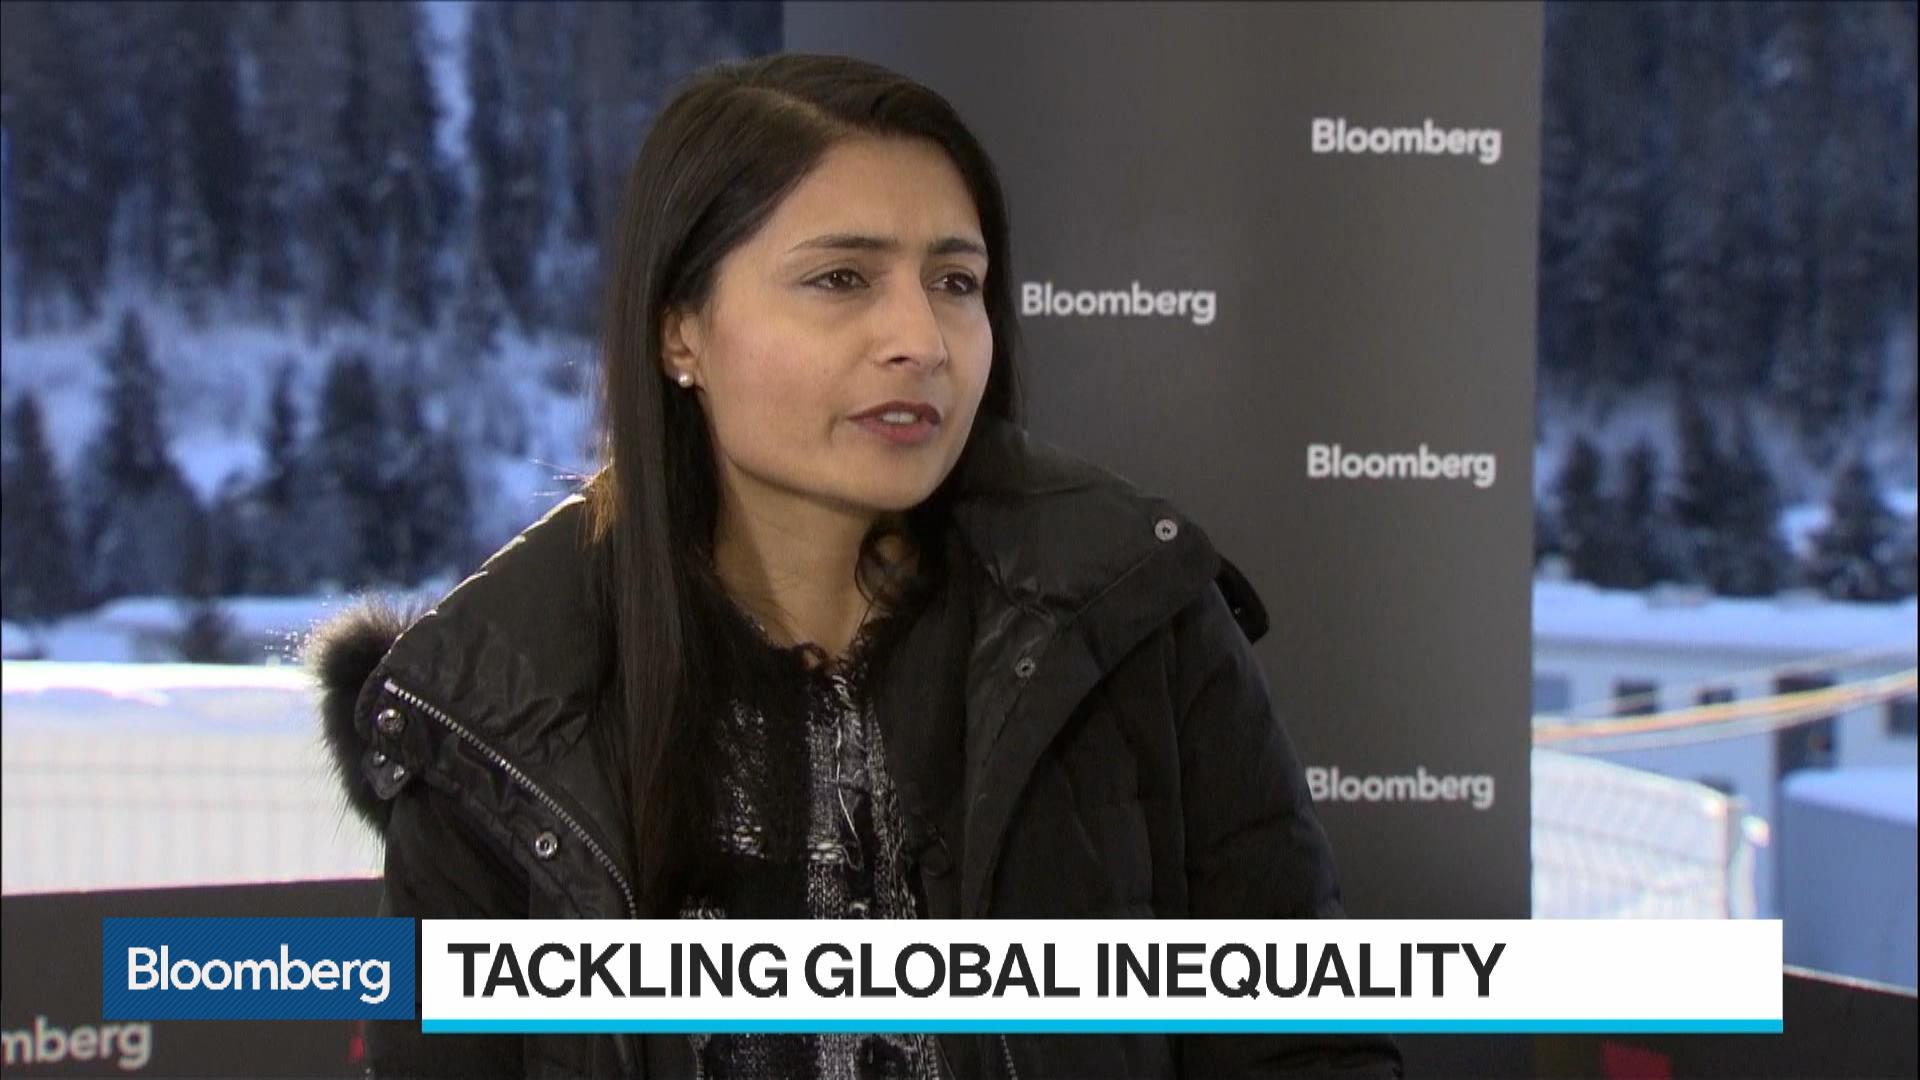 Digital: WEF Managing Director Saadia Zahidi on Equality Jan 21, 2020